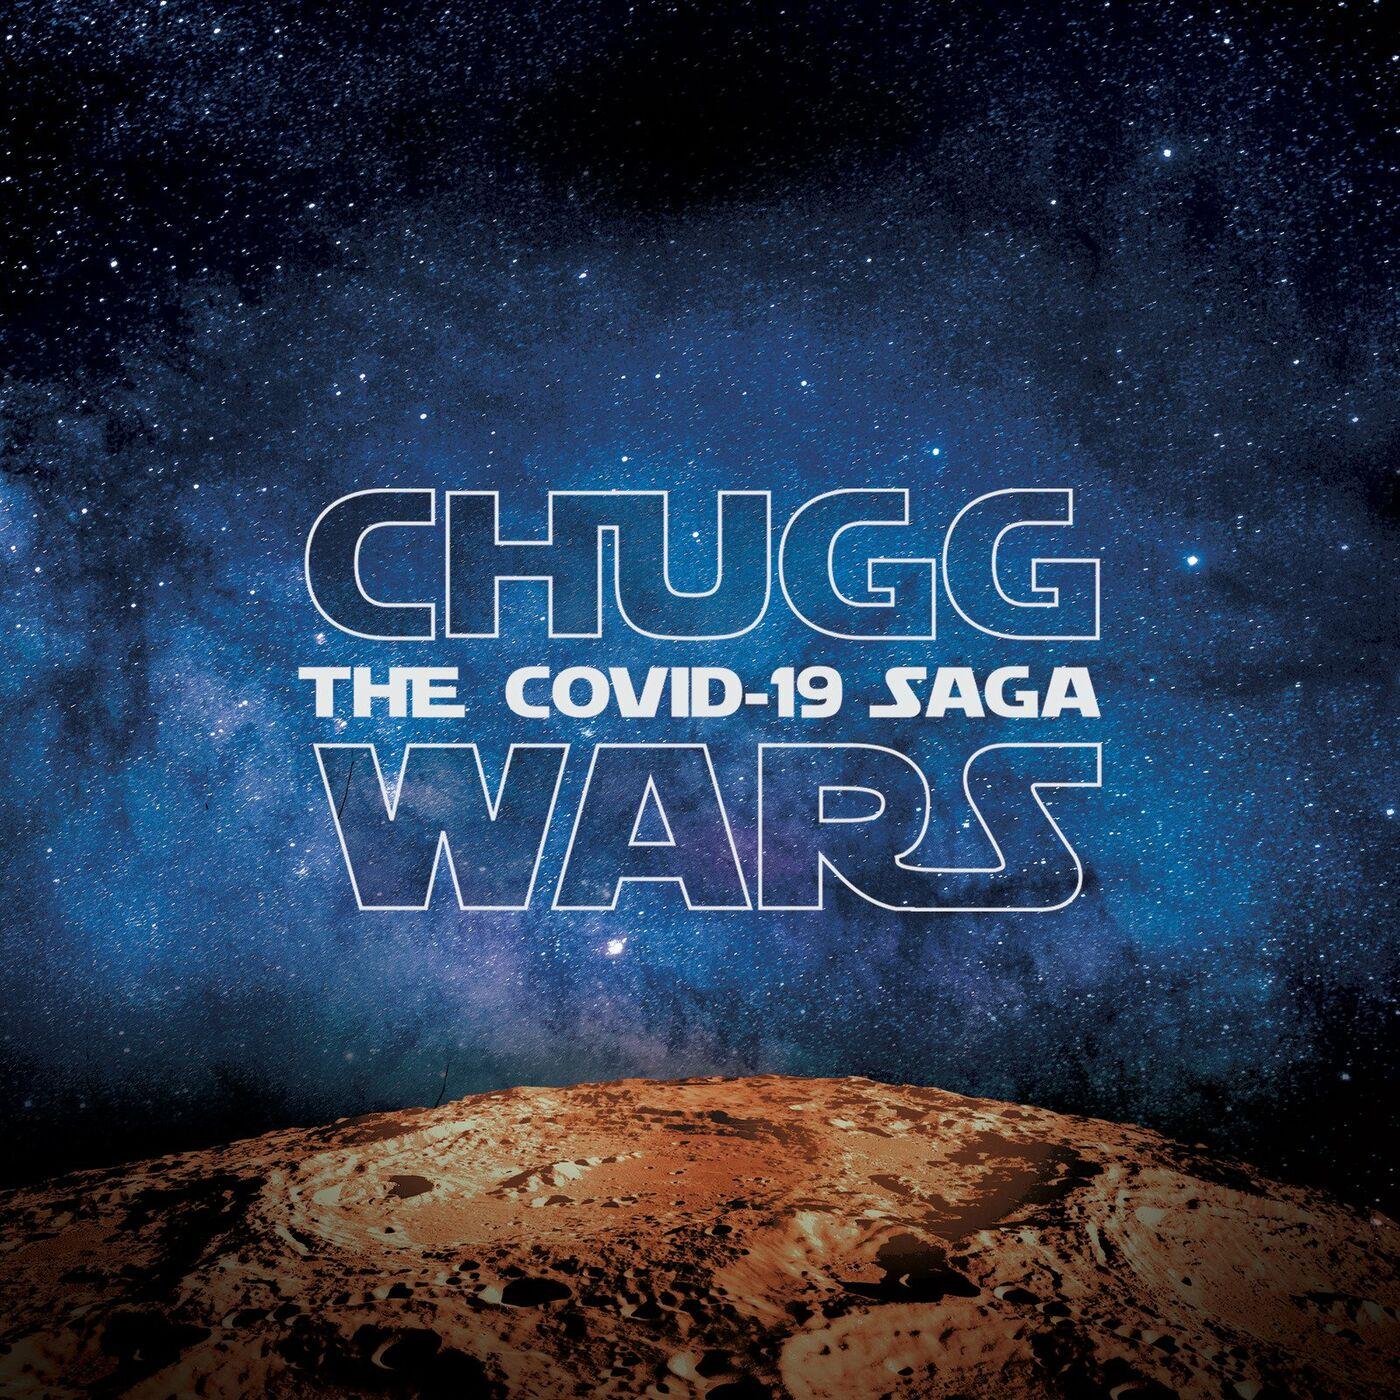 ChuggaBoom - Chugg Wars: The Covid-19 Saga [EP] (2020)